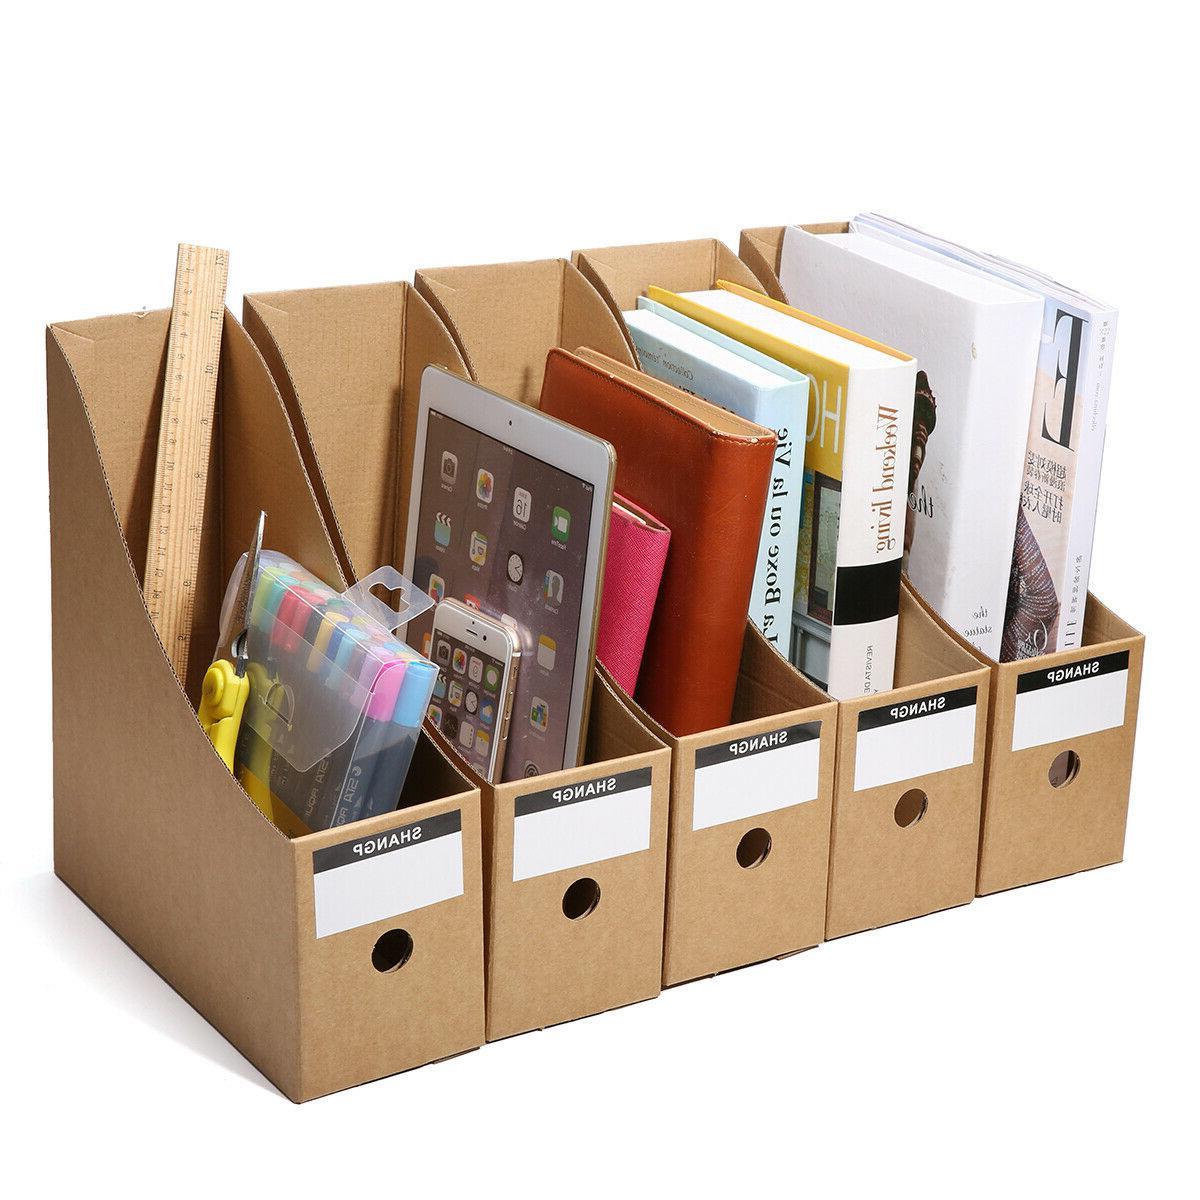 Folder Book Paper Storage for Home